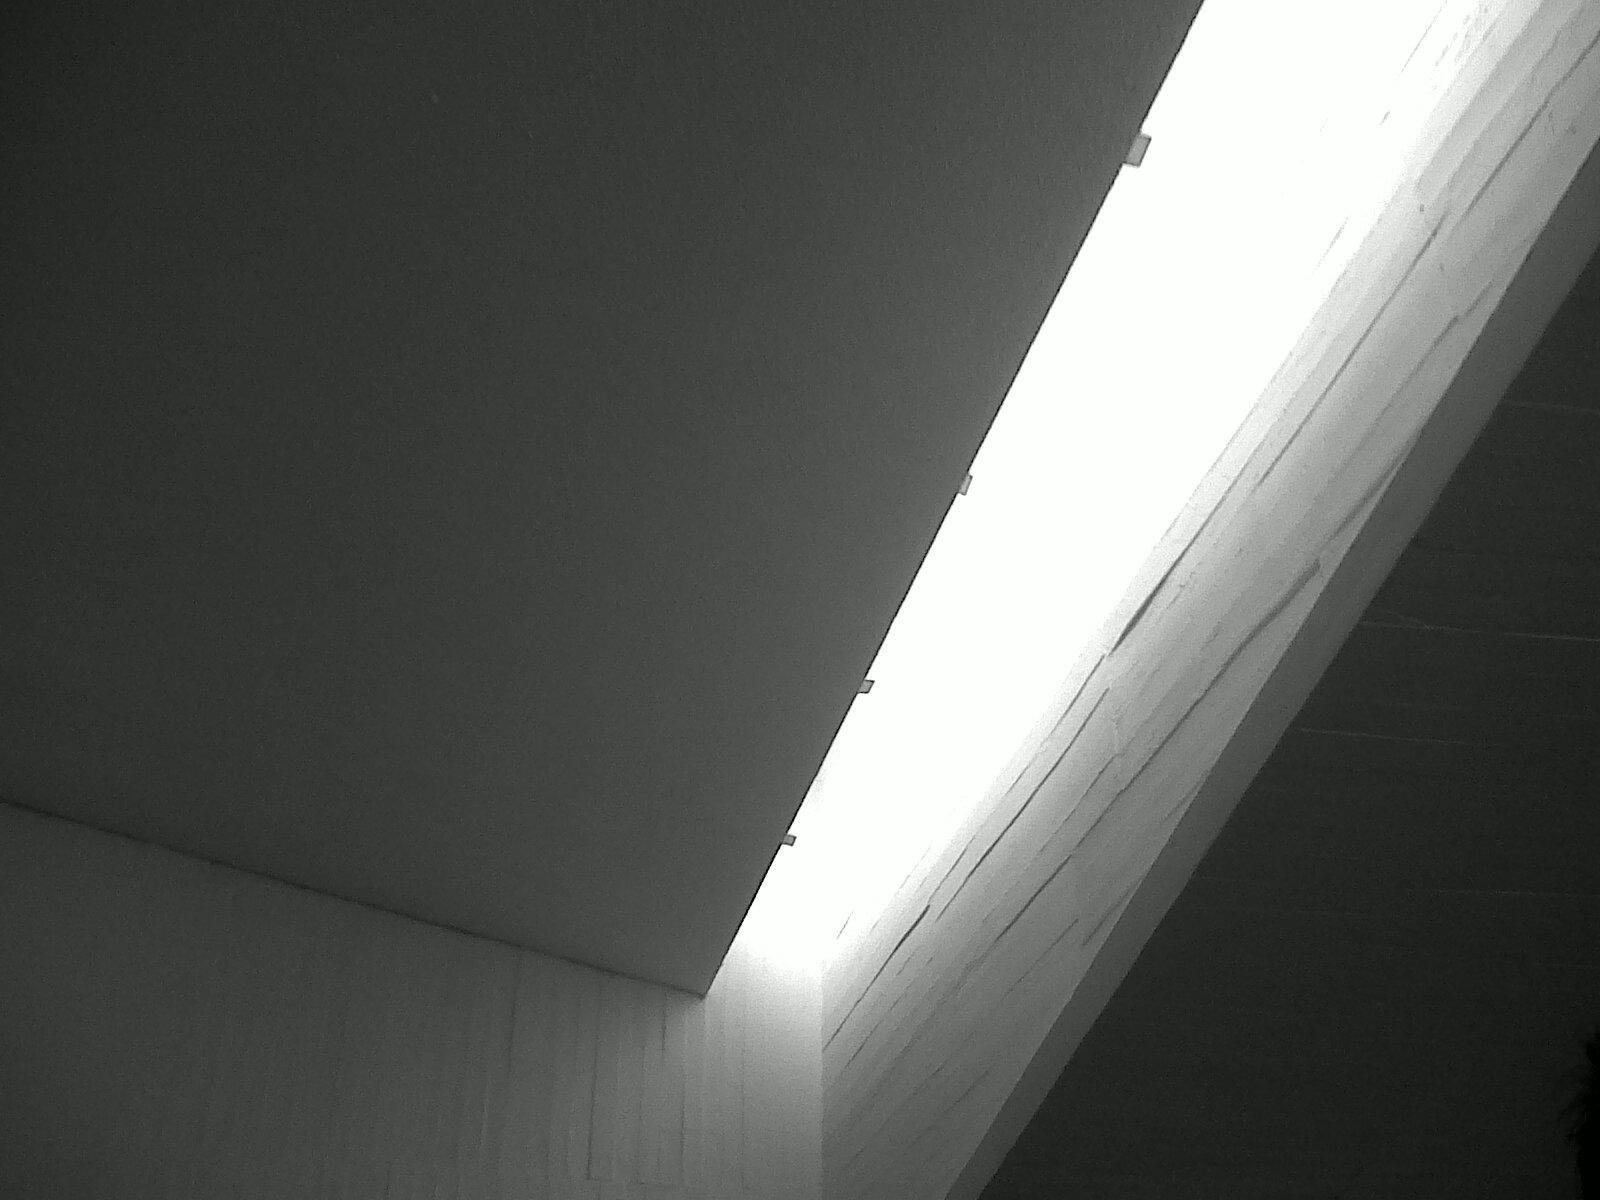 IMG00107-20130514-1529.jpg